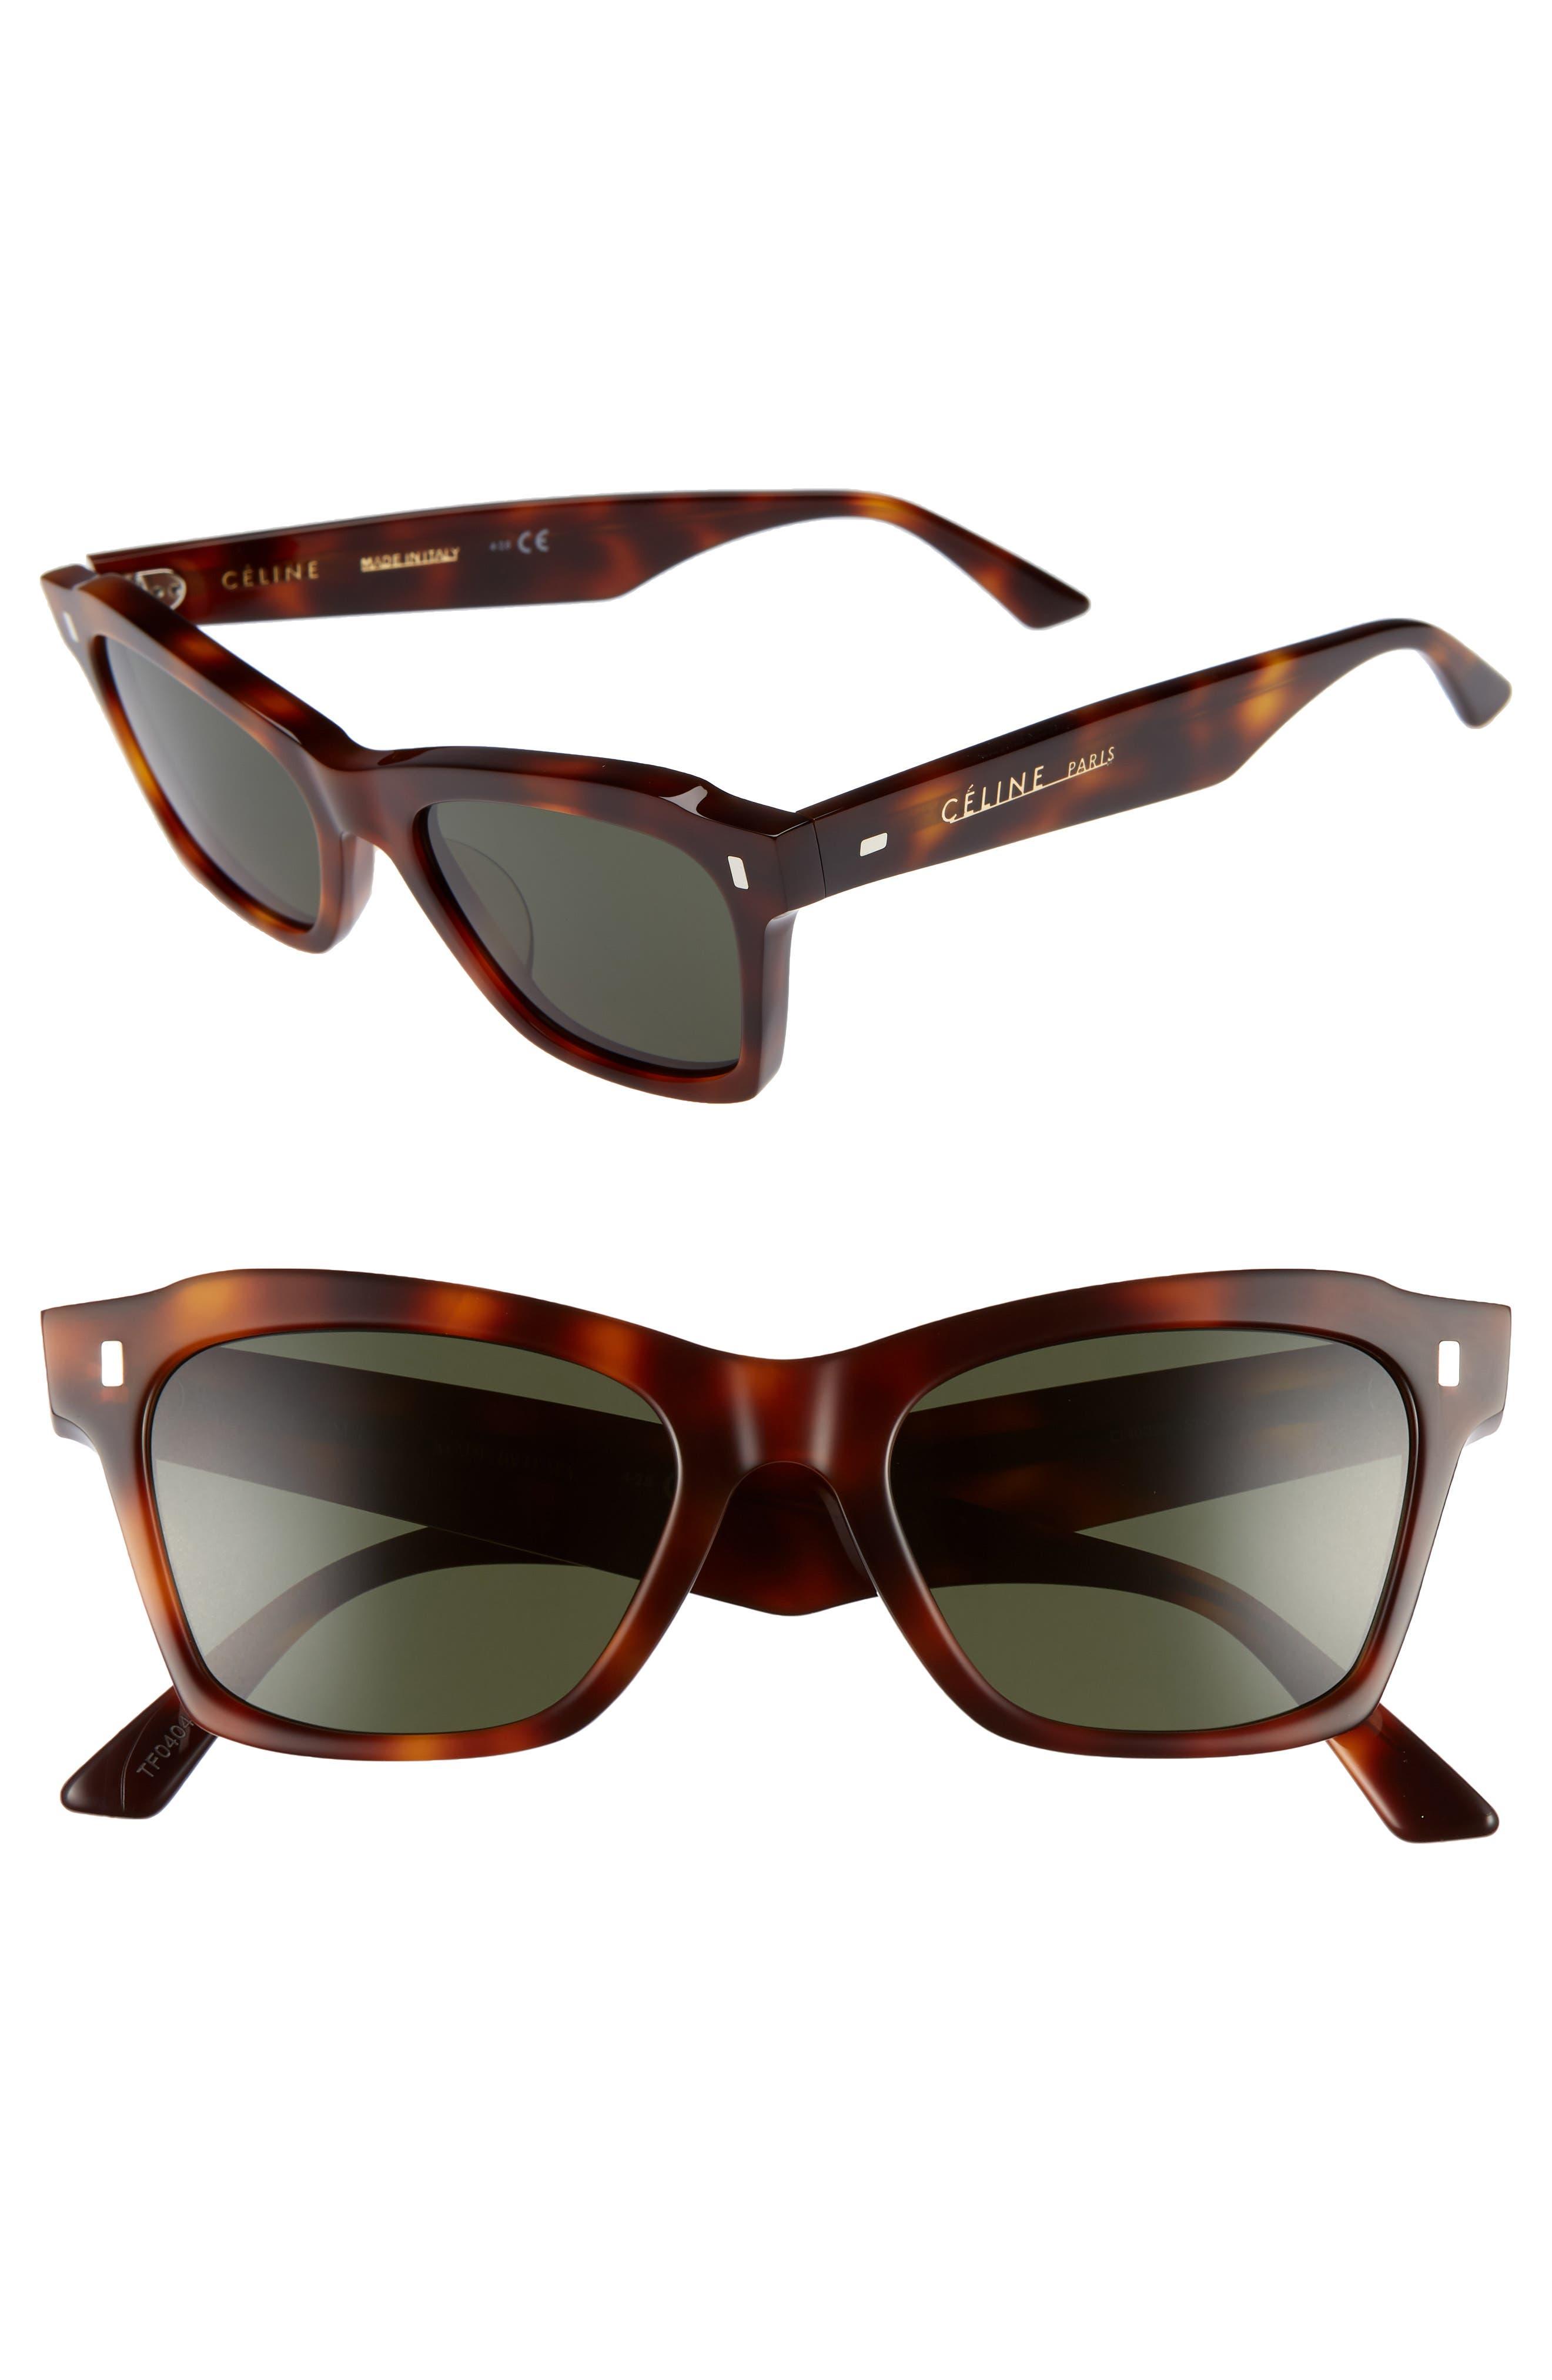 52Mm Rectangle Cat Eye Sunglasses - Classic Havana